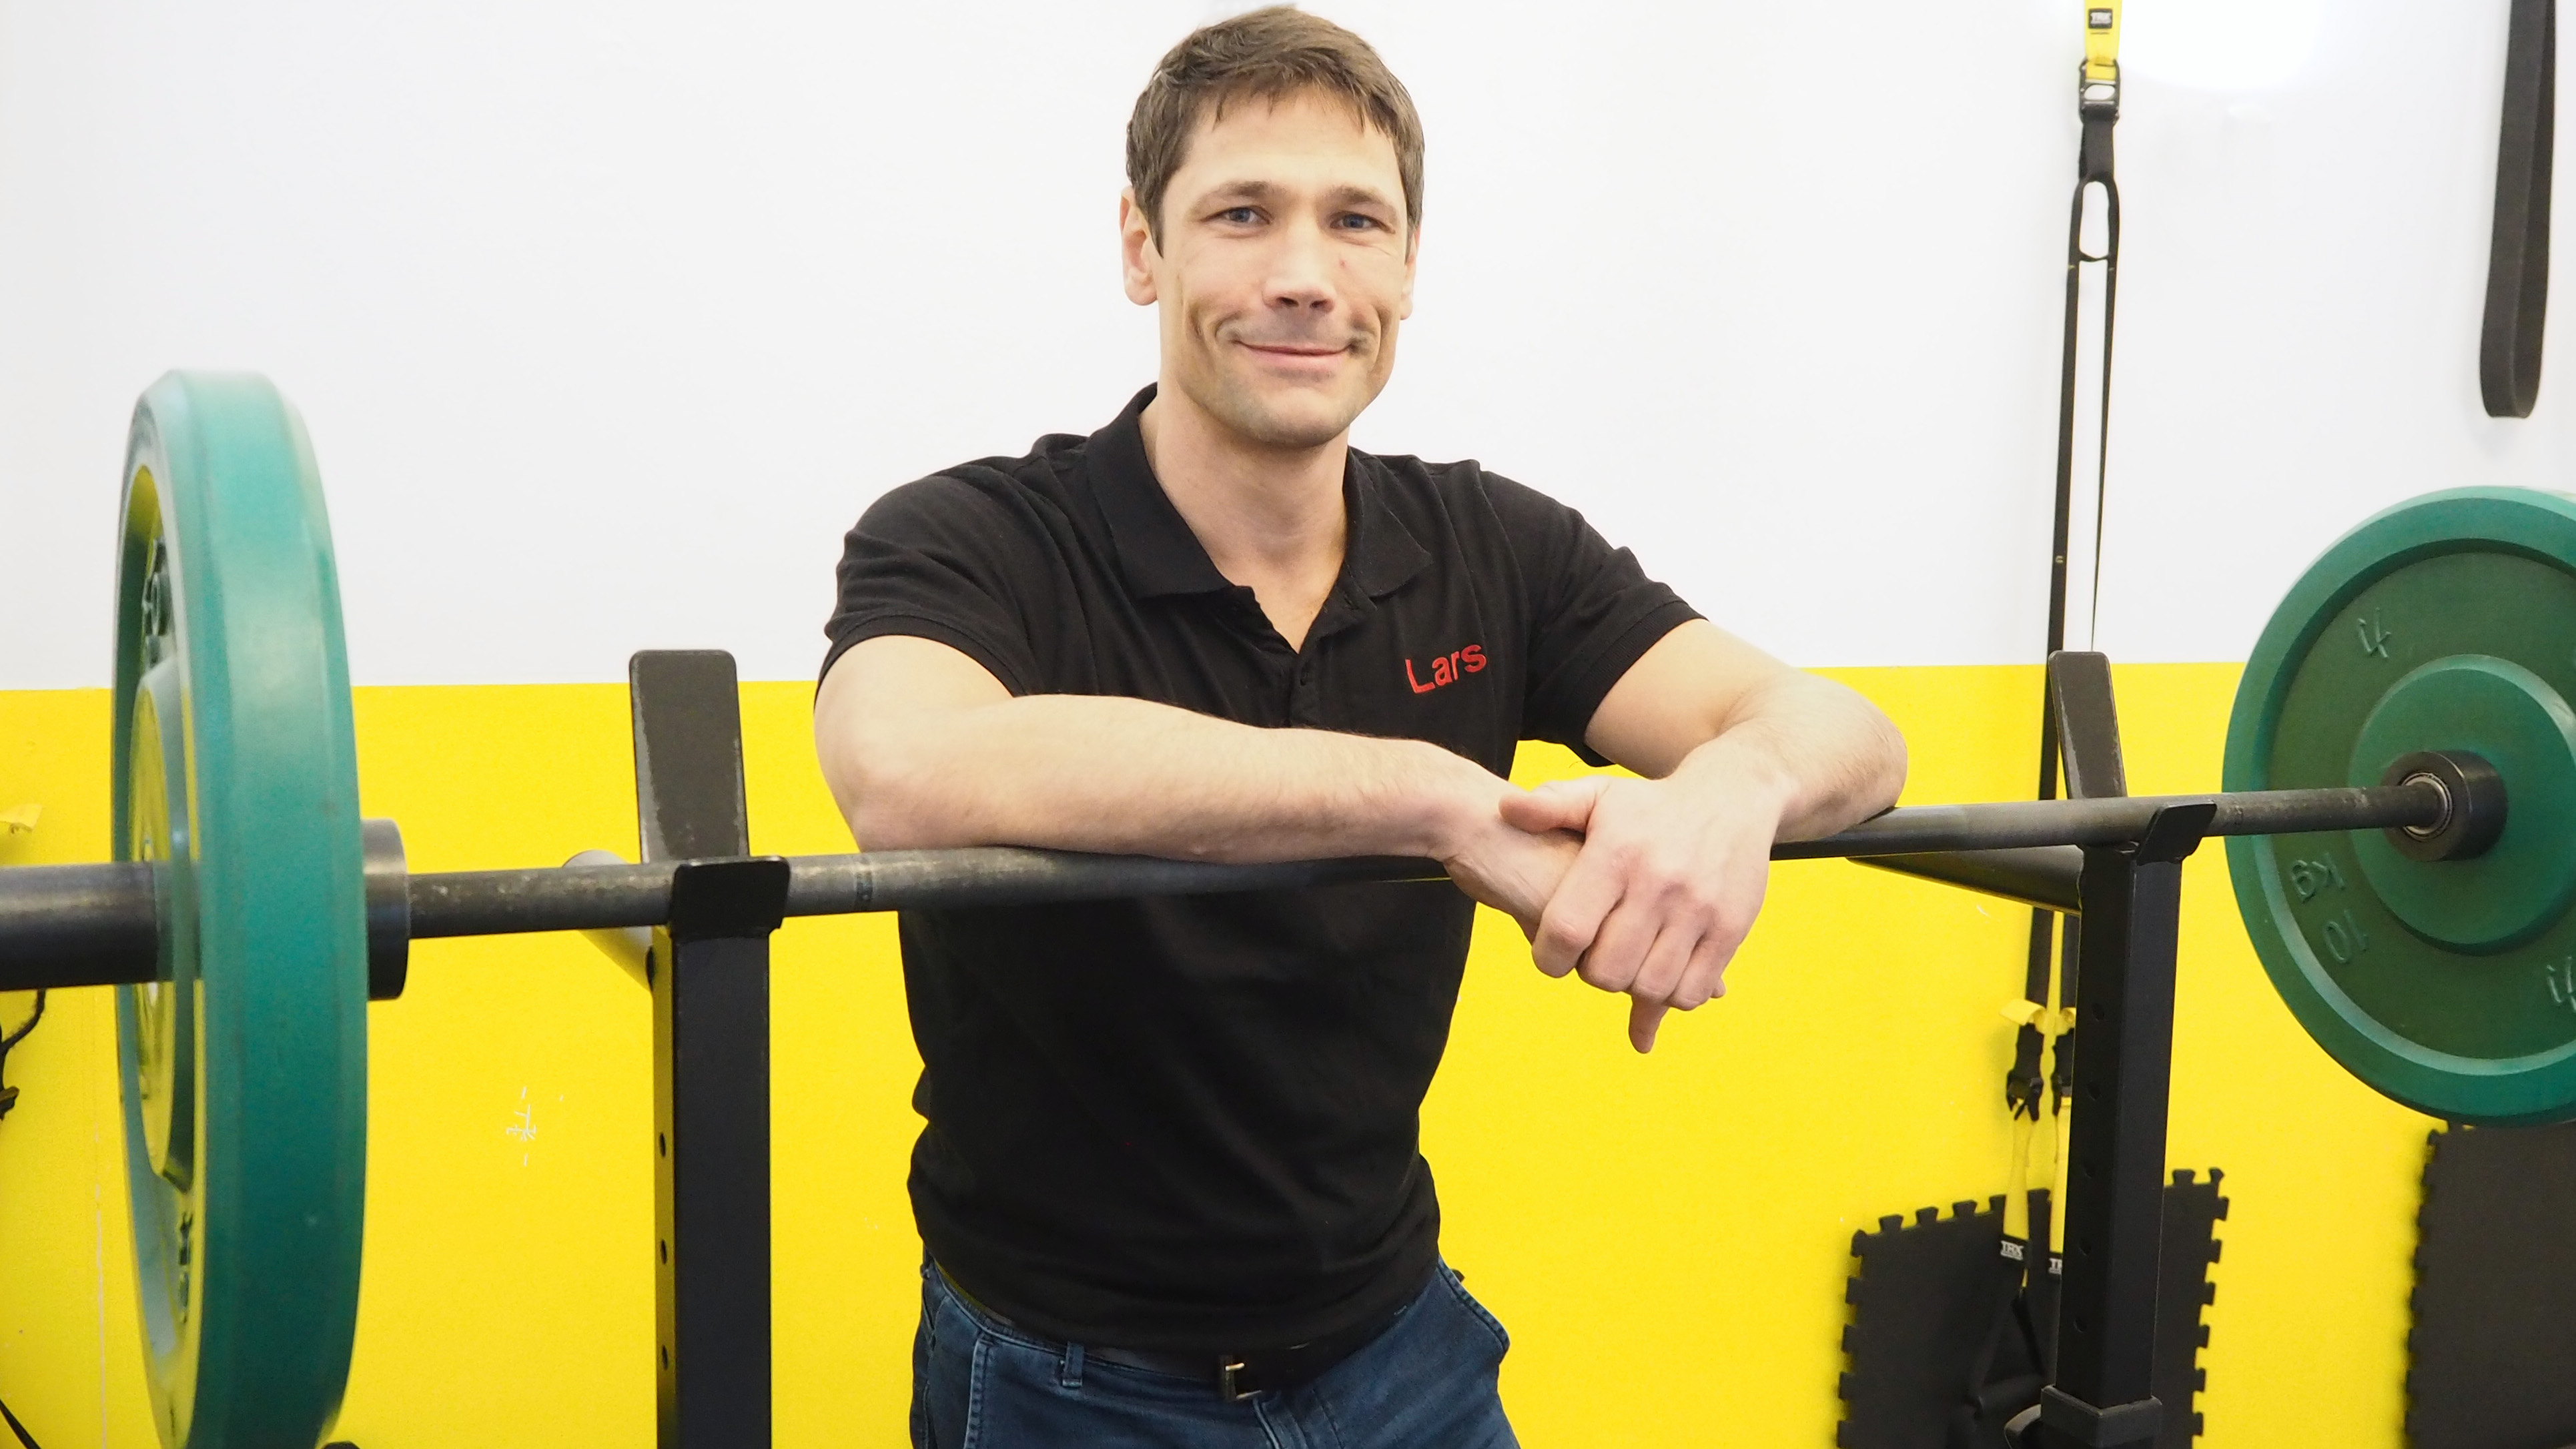 Lars Rosenbaum ist Geschaeftsfuehrer des Personal Fitnessstudios Ignite Fit